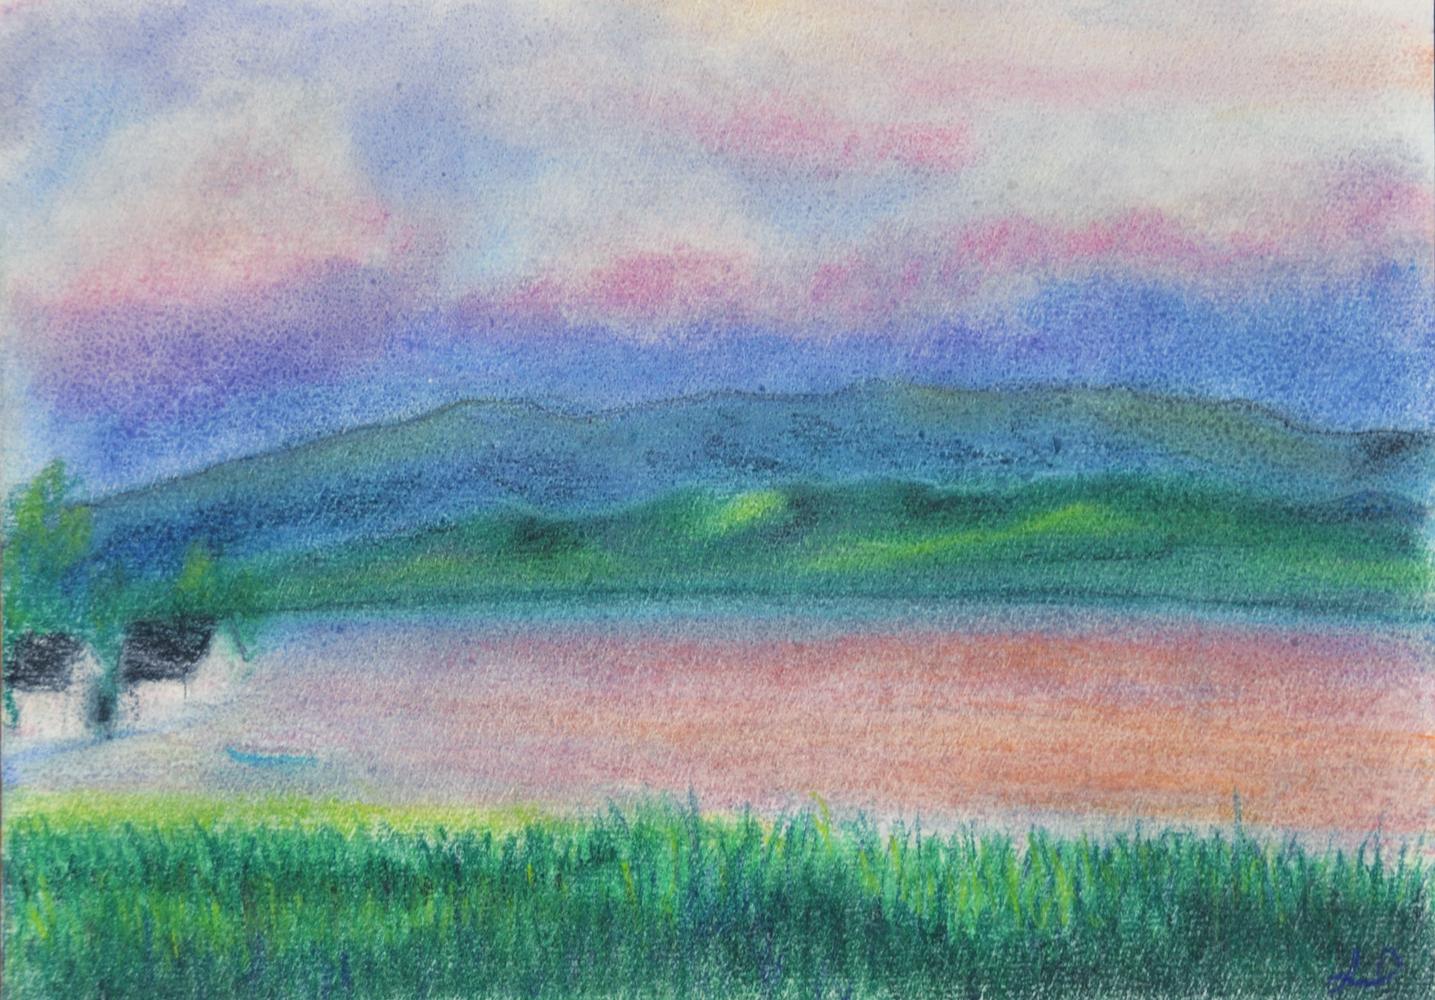 Lake Zurich no. 2. Dry pastel on paper. 15x21, 2013